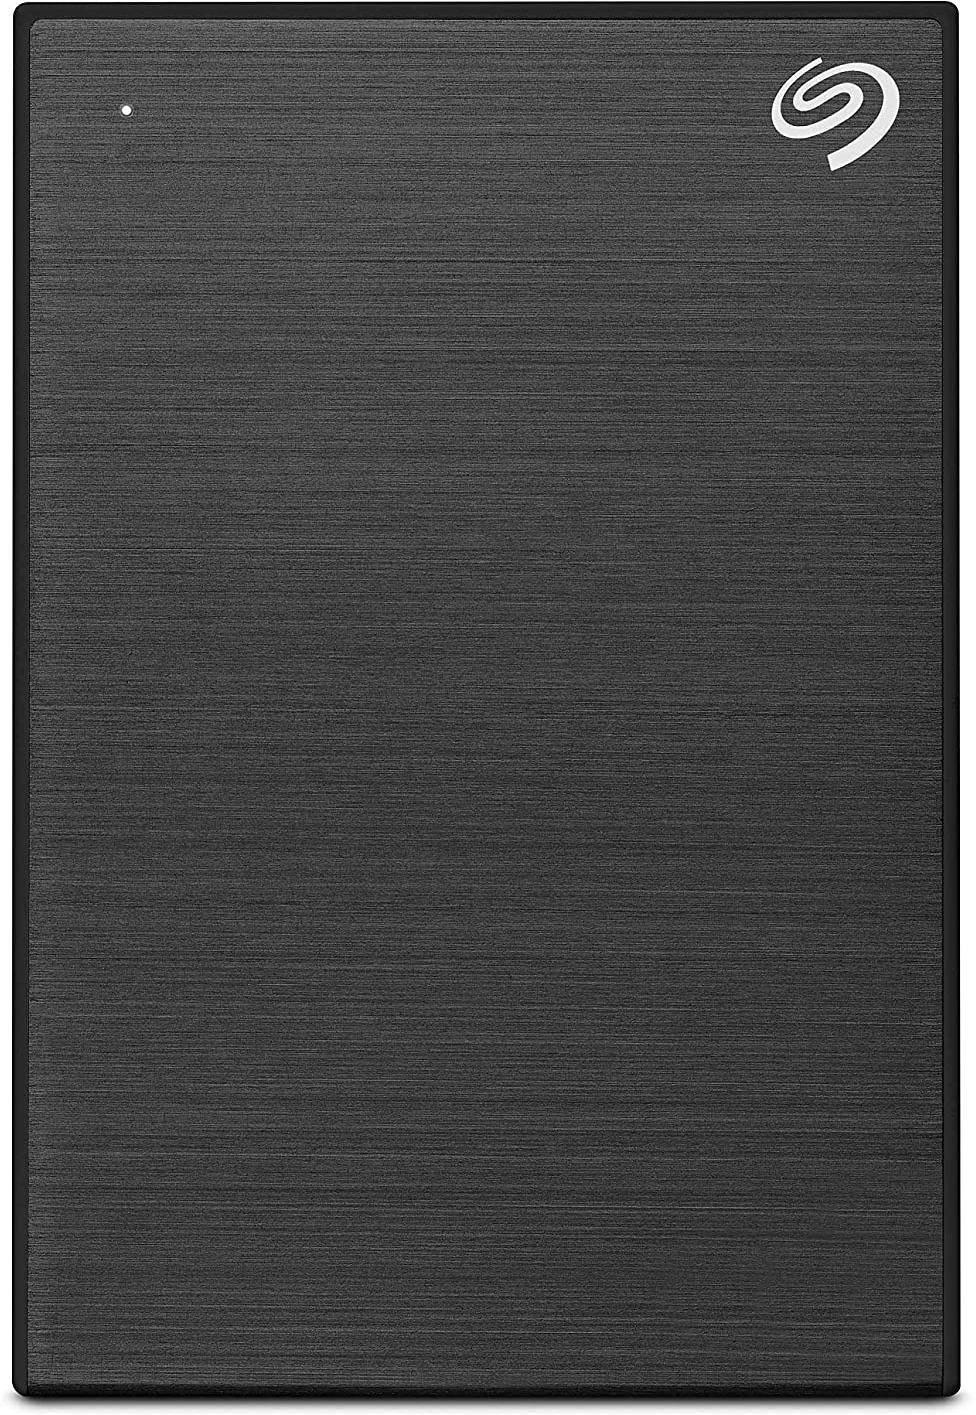 Seagate Backup Plus Slim 1TB Portable External Hard Drive  zoom image